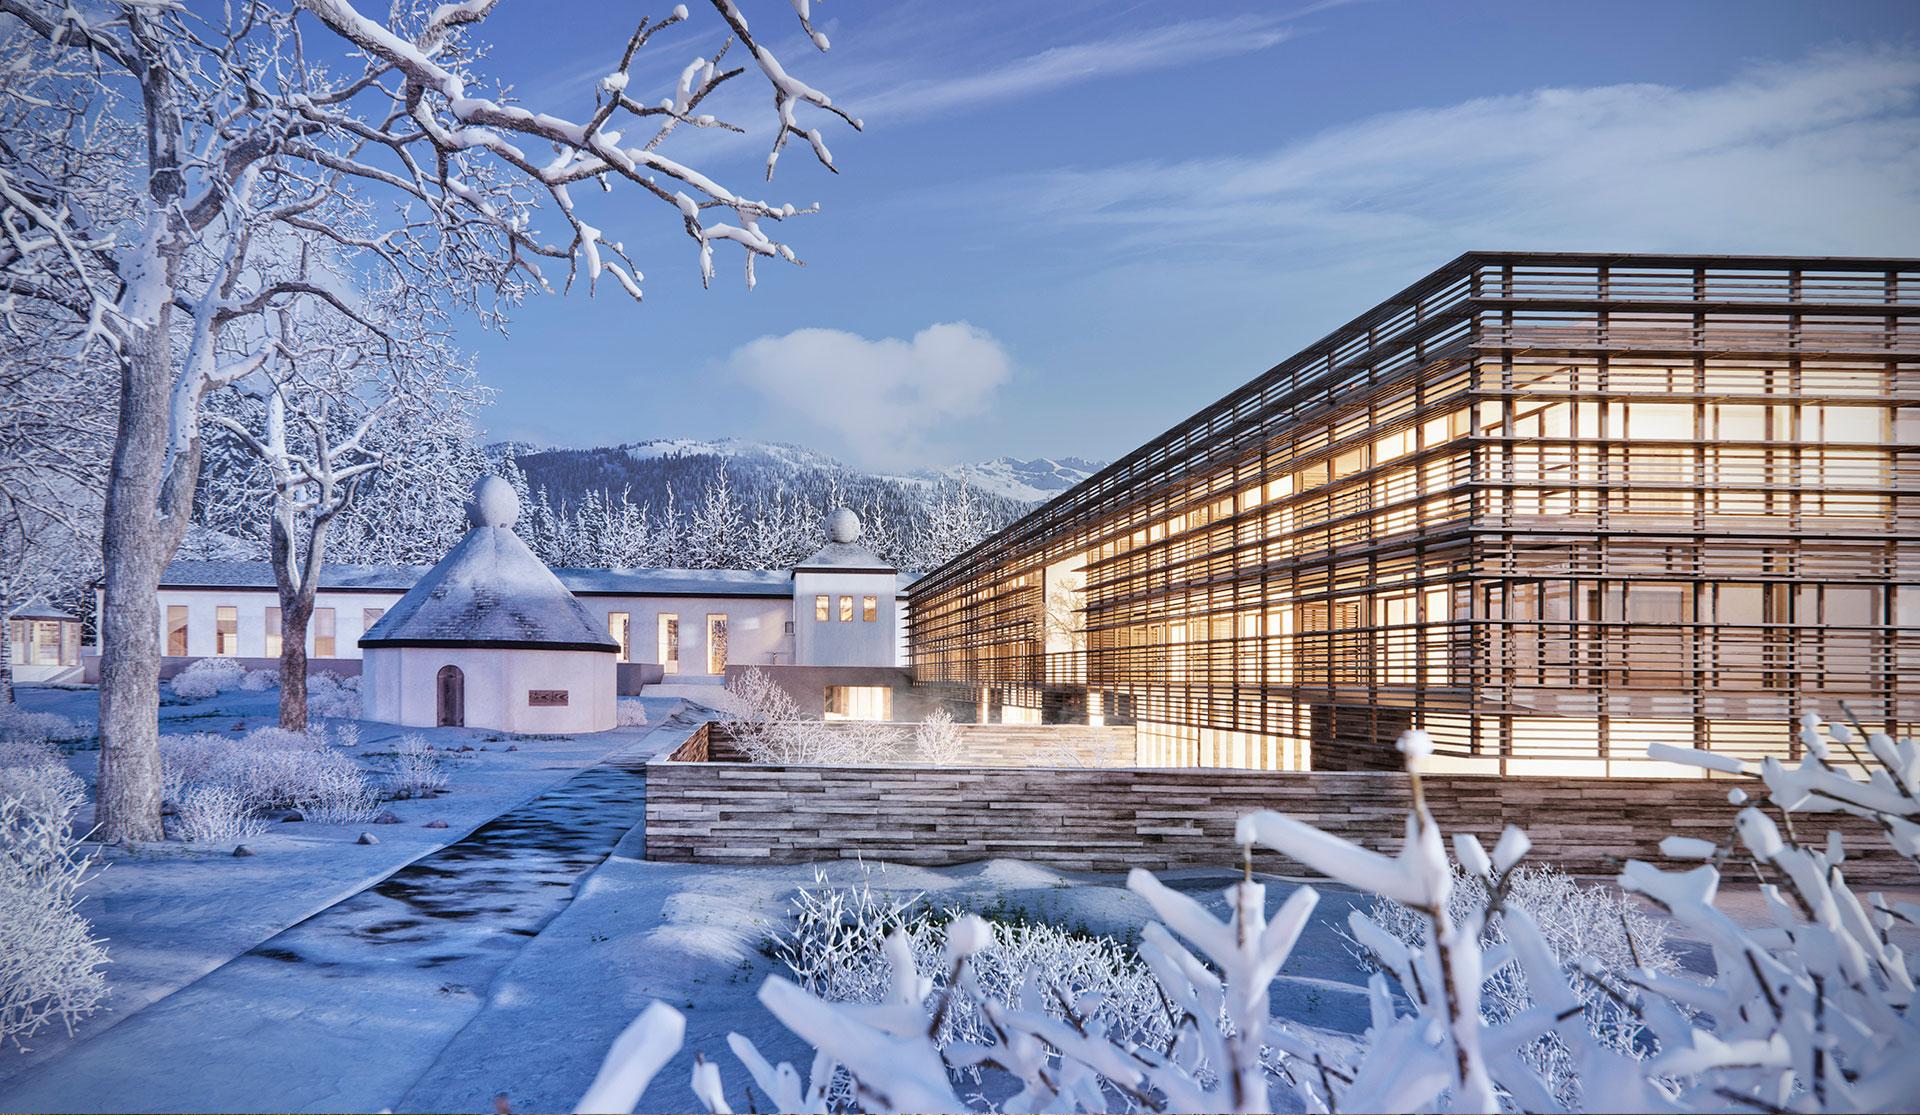 bavarian lake village matteo thun partners. Black Bedroom Furniture Sets. Home Design Ideas